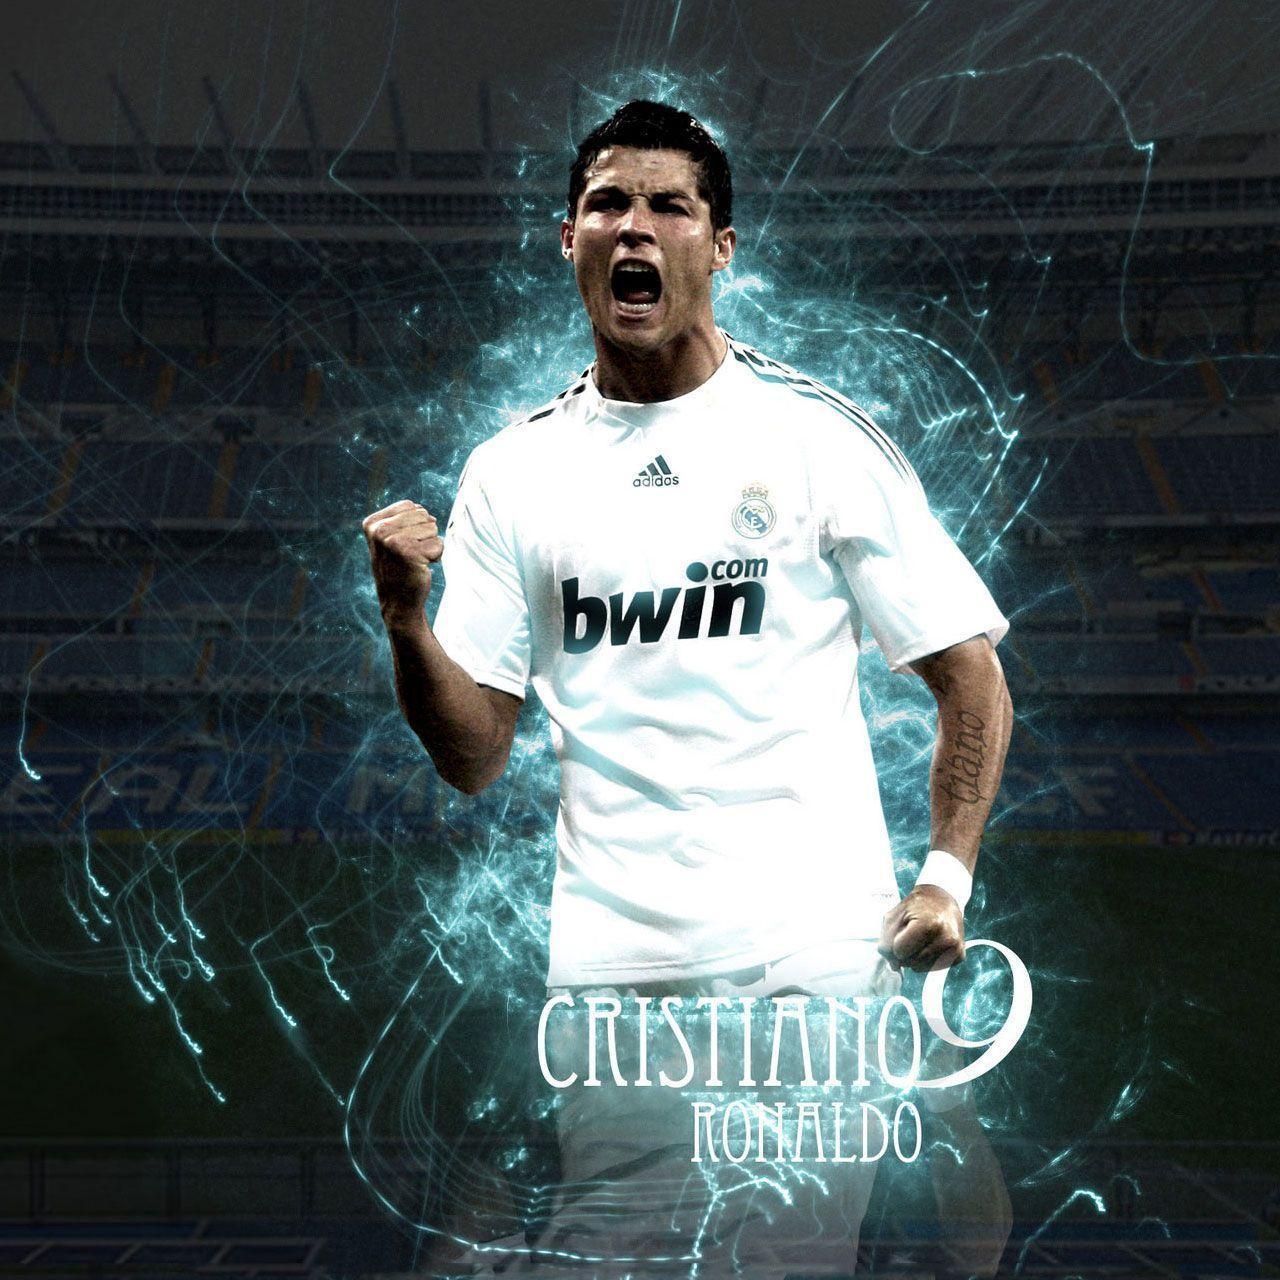 Cristiano Ronaldo Wallpaper: Ronaldo Cristiano Wallpapers